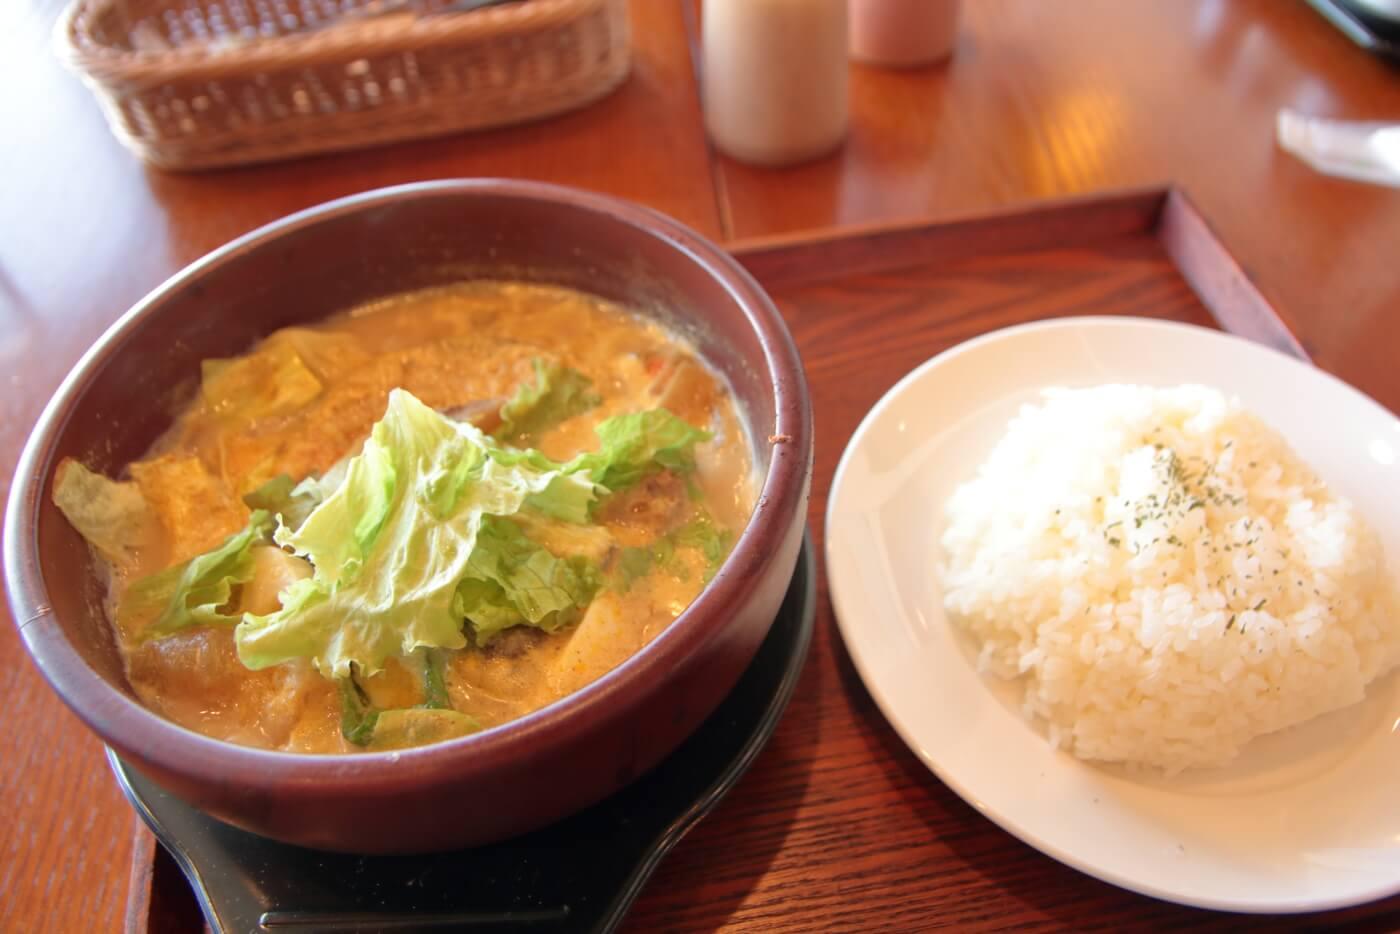 Real食堂 西山珈琲館 国産牛スジ肉のミルク入りスープカレー